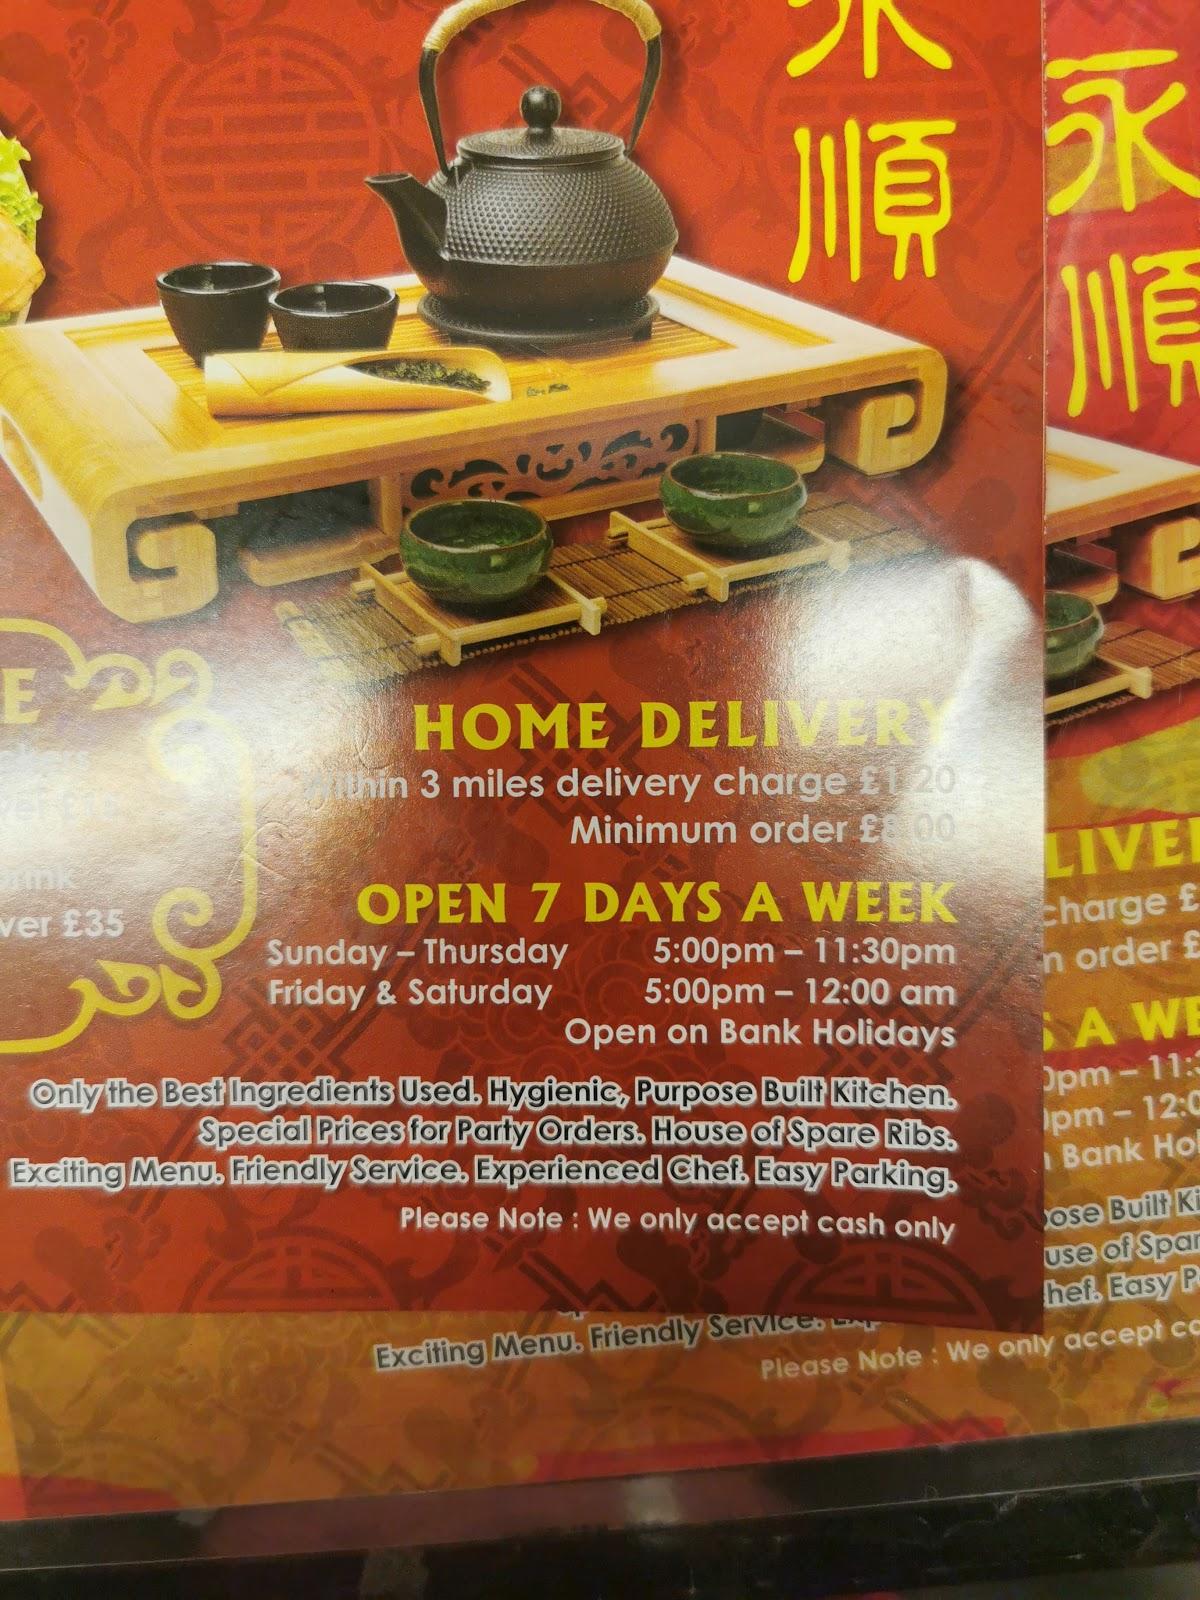 Menu Of Wingshun Take Away Food Shops Fast Food Rugeley Reviews And Ratings